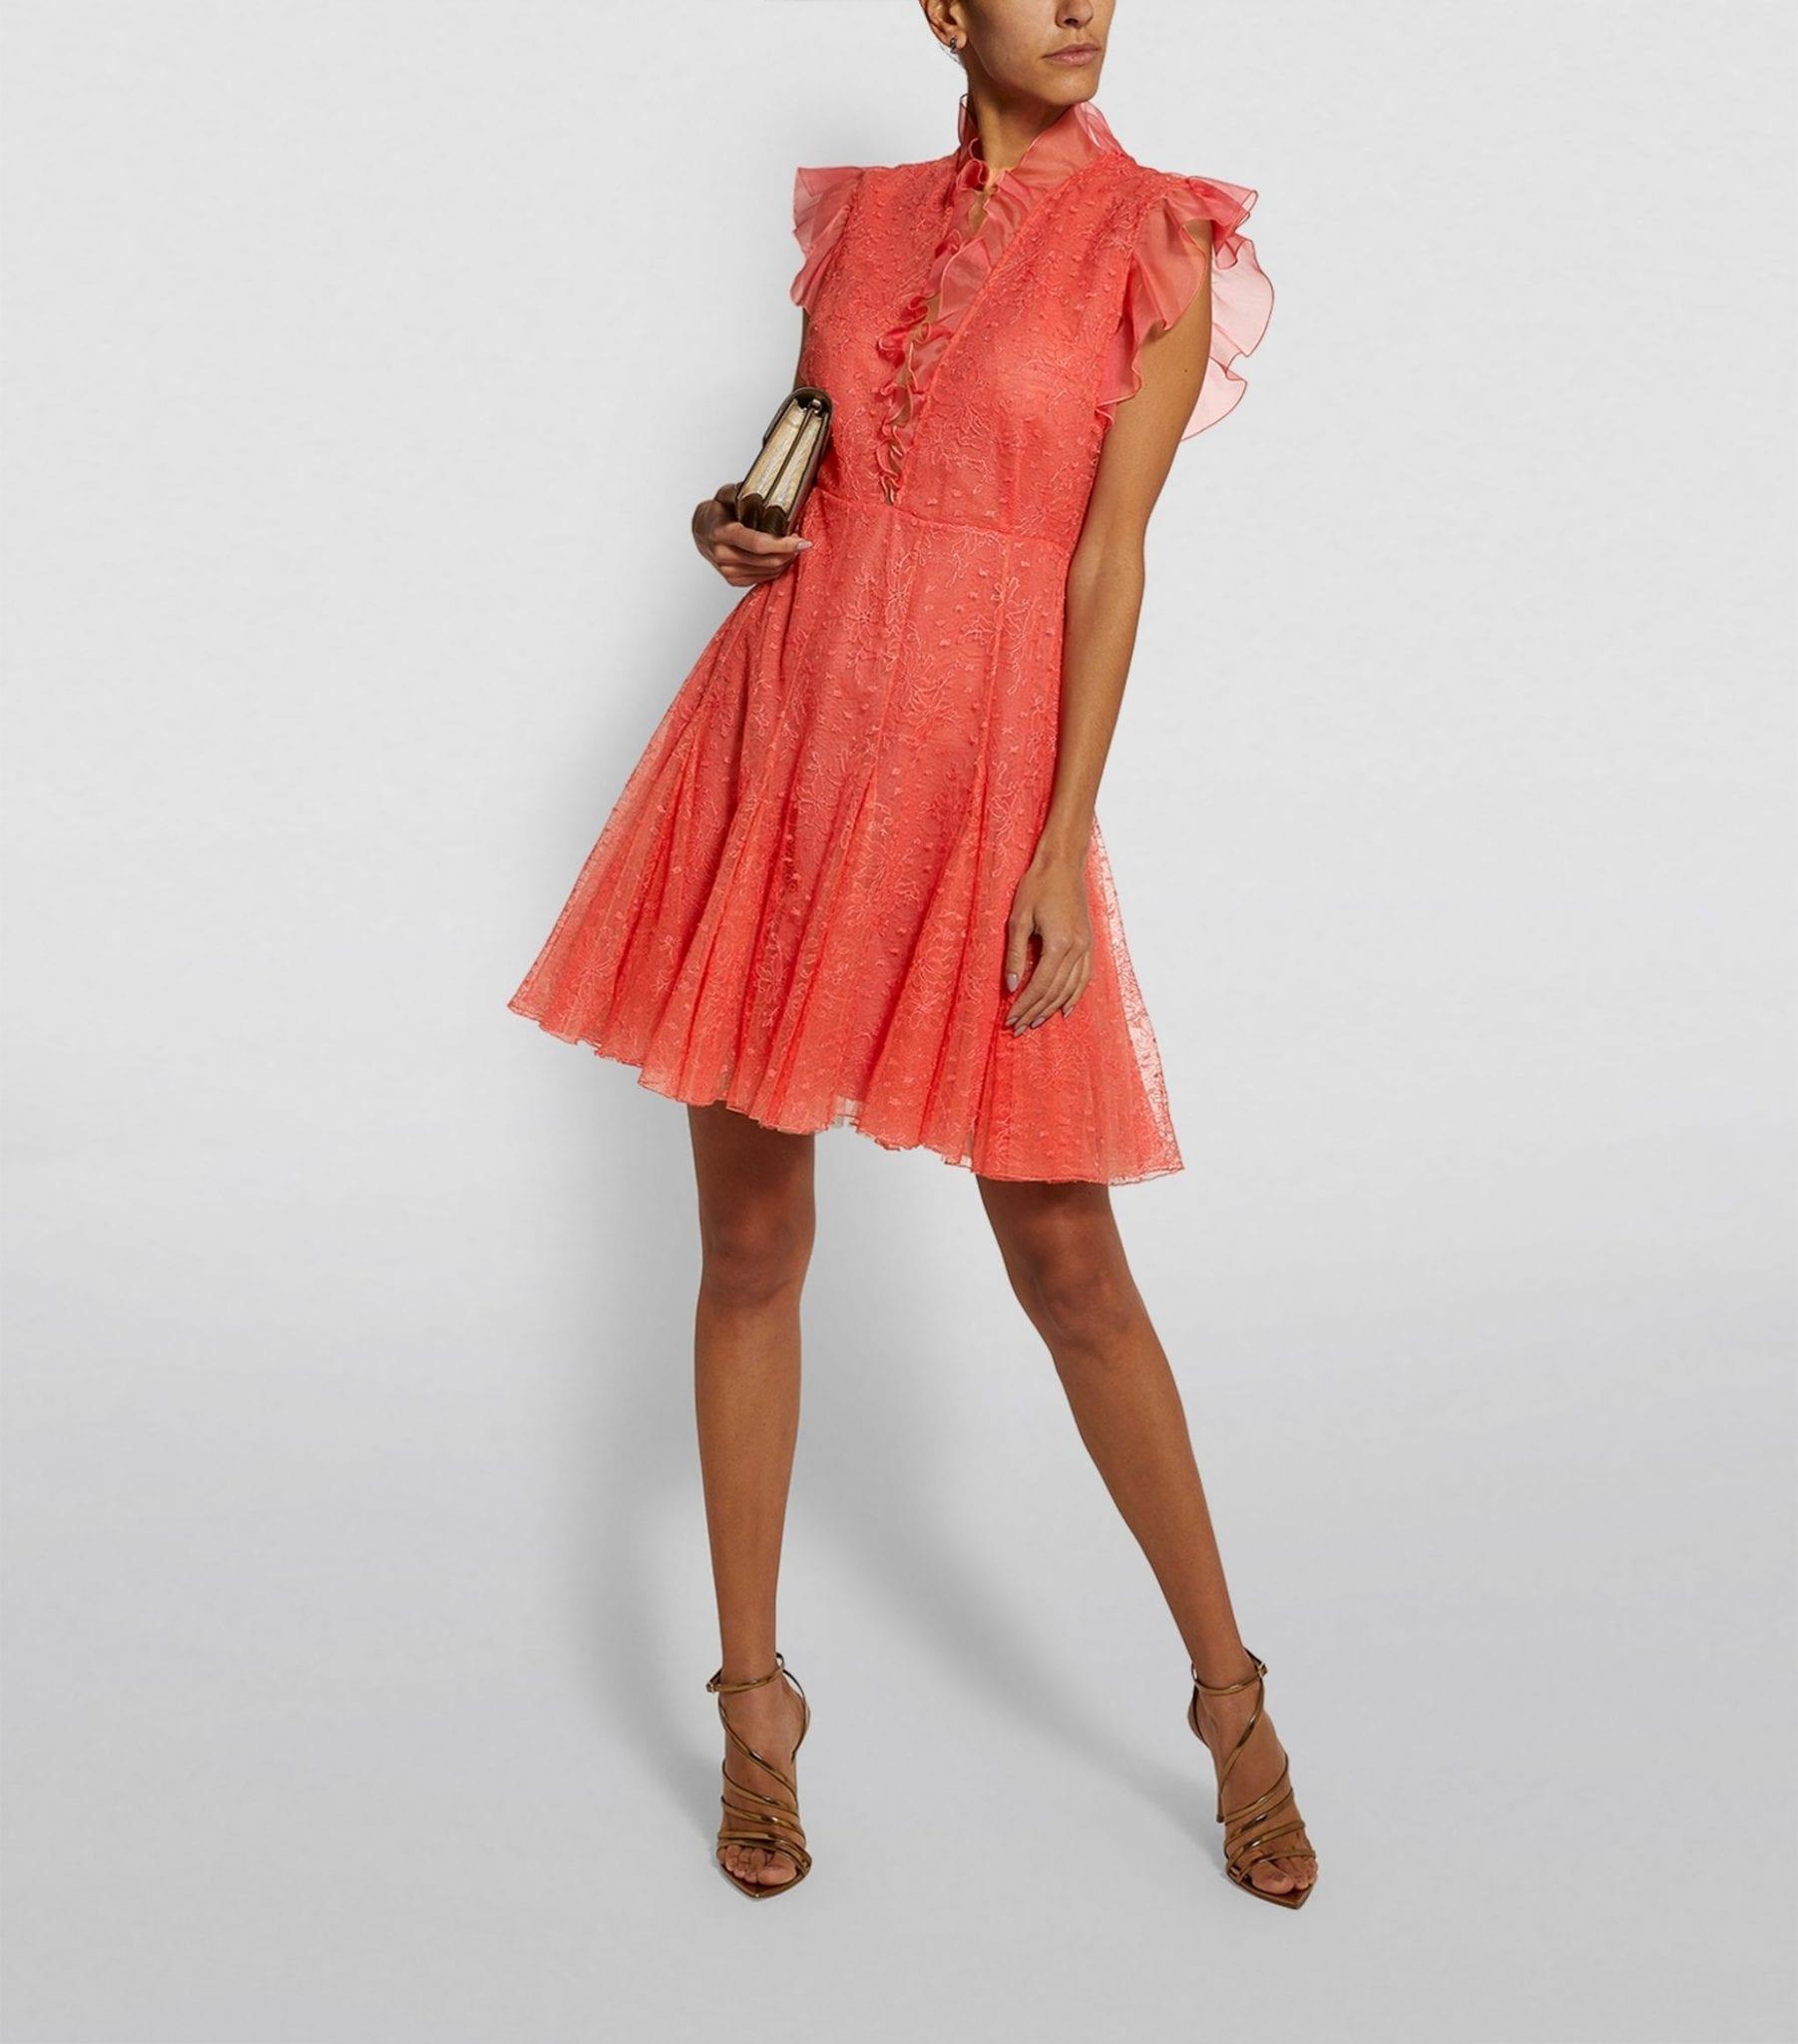 GIAMBATTISTA VALLI Floral Lace Ruffle Mini Dress